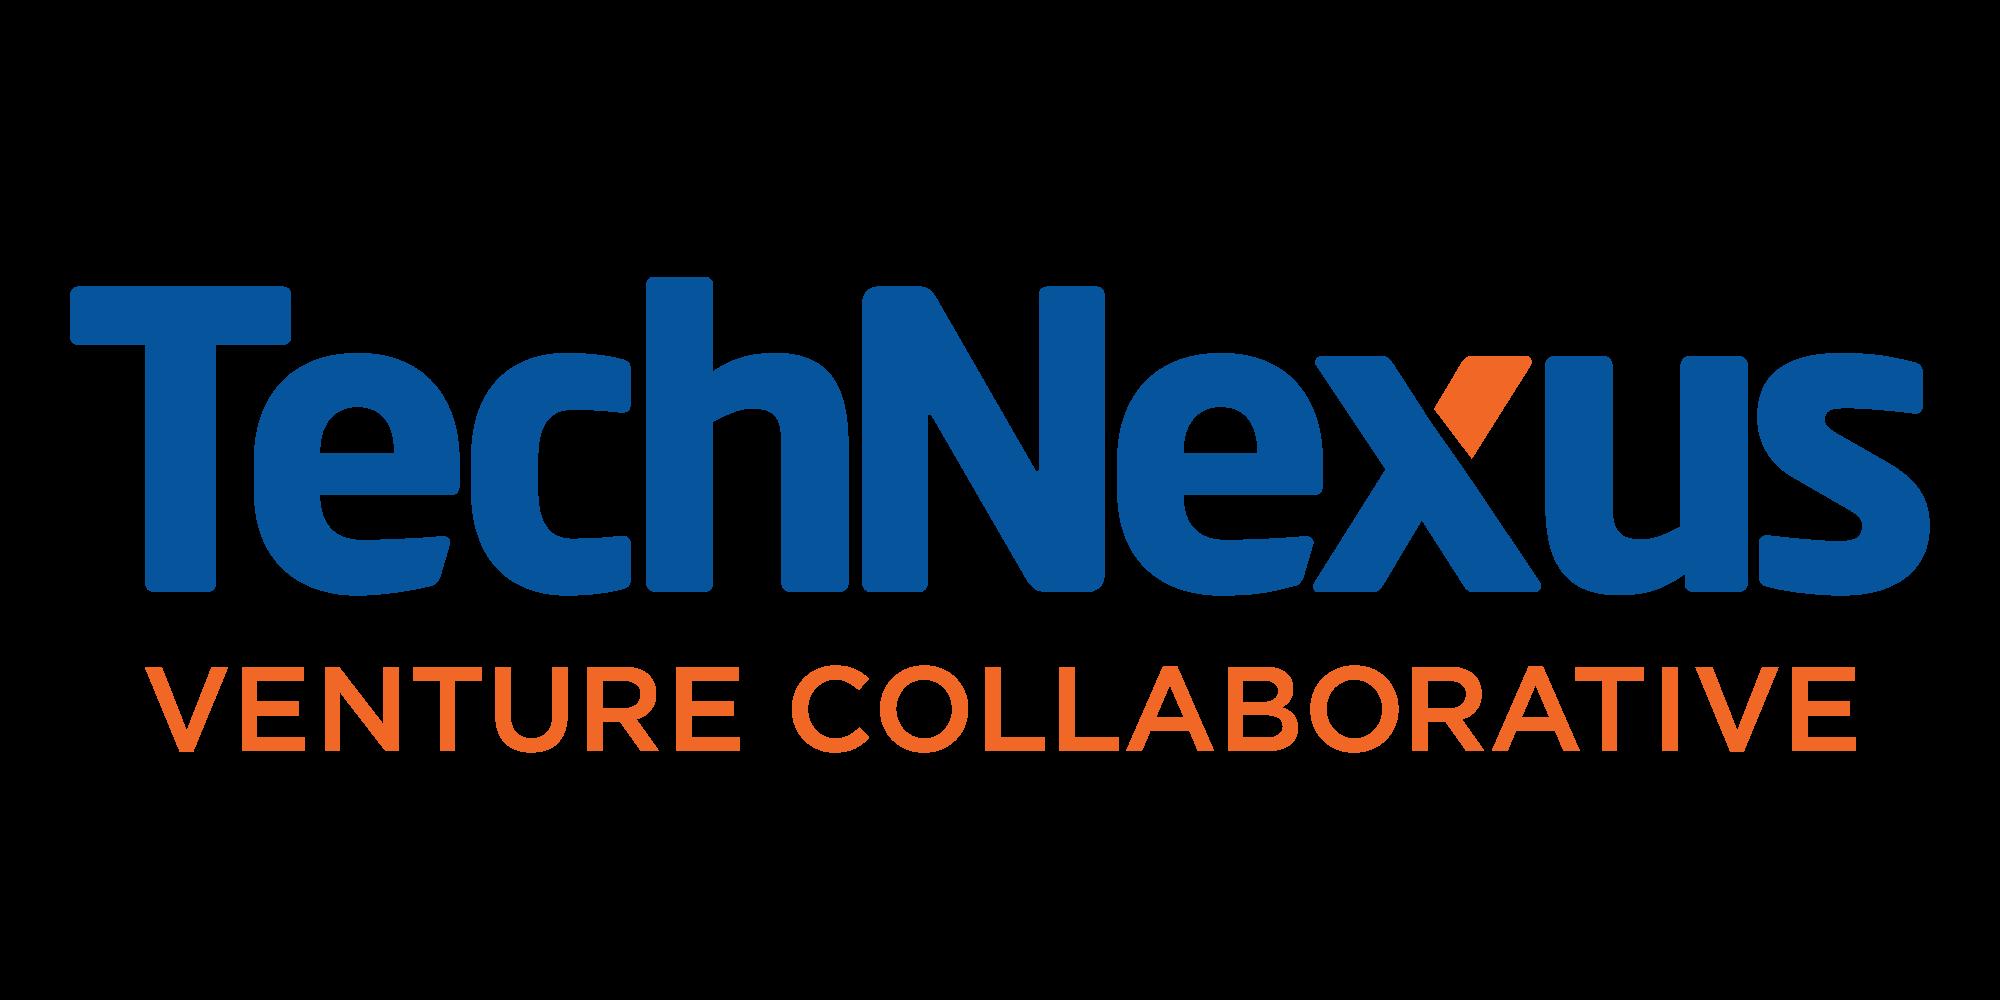 TechNexus Venture Collaborative logo